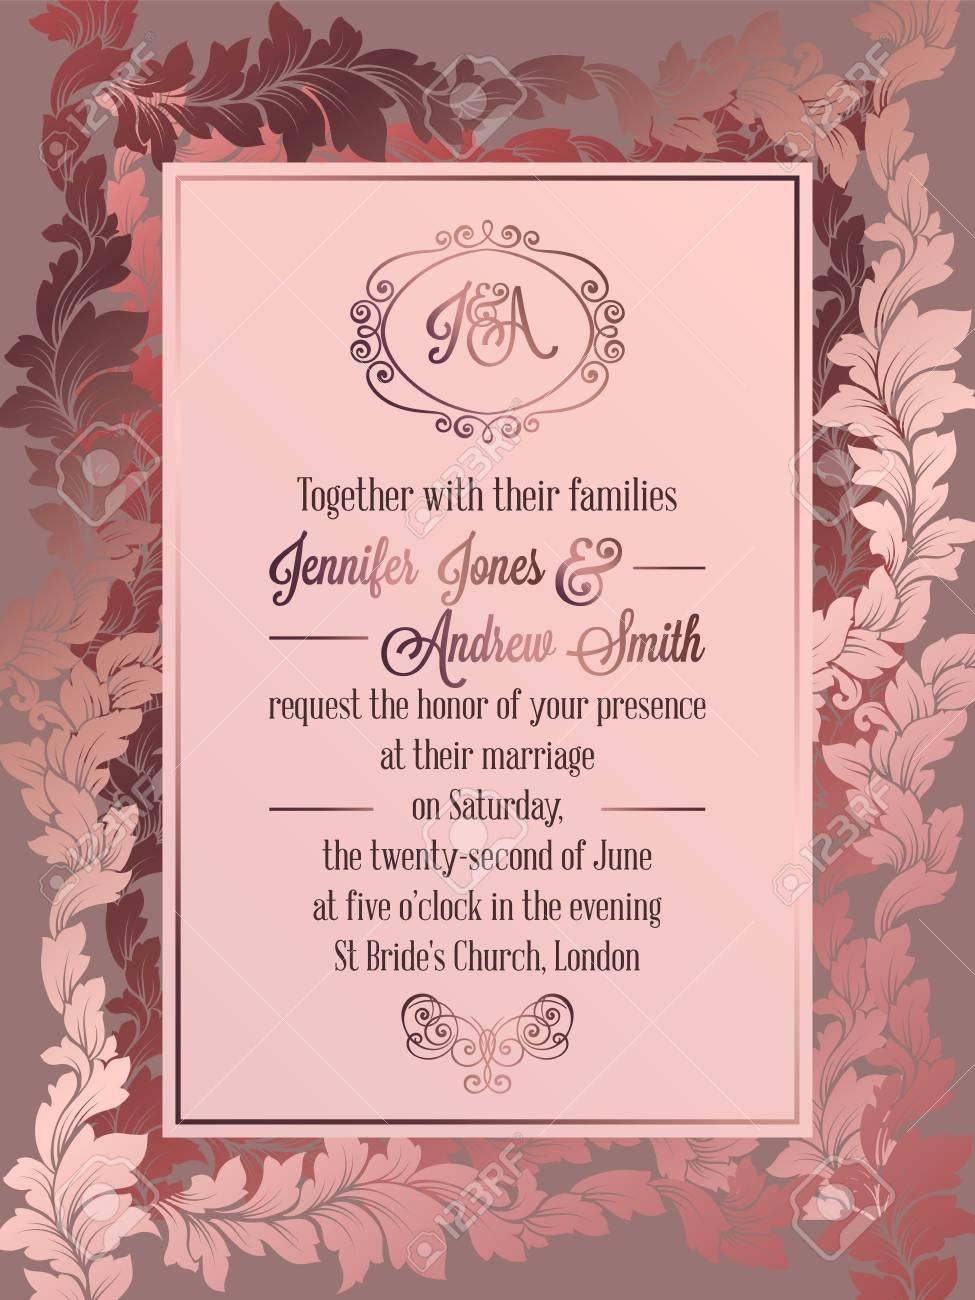 Vintage Baroque Style Wedding Invitation Card Template Elegant With Ch Wedding Invitation Card Template Wedding Invitation Card Design Pink Wedding Invitations